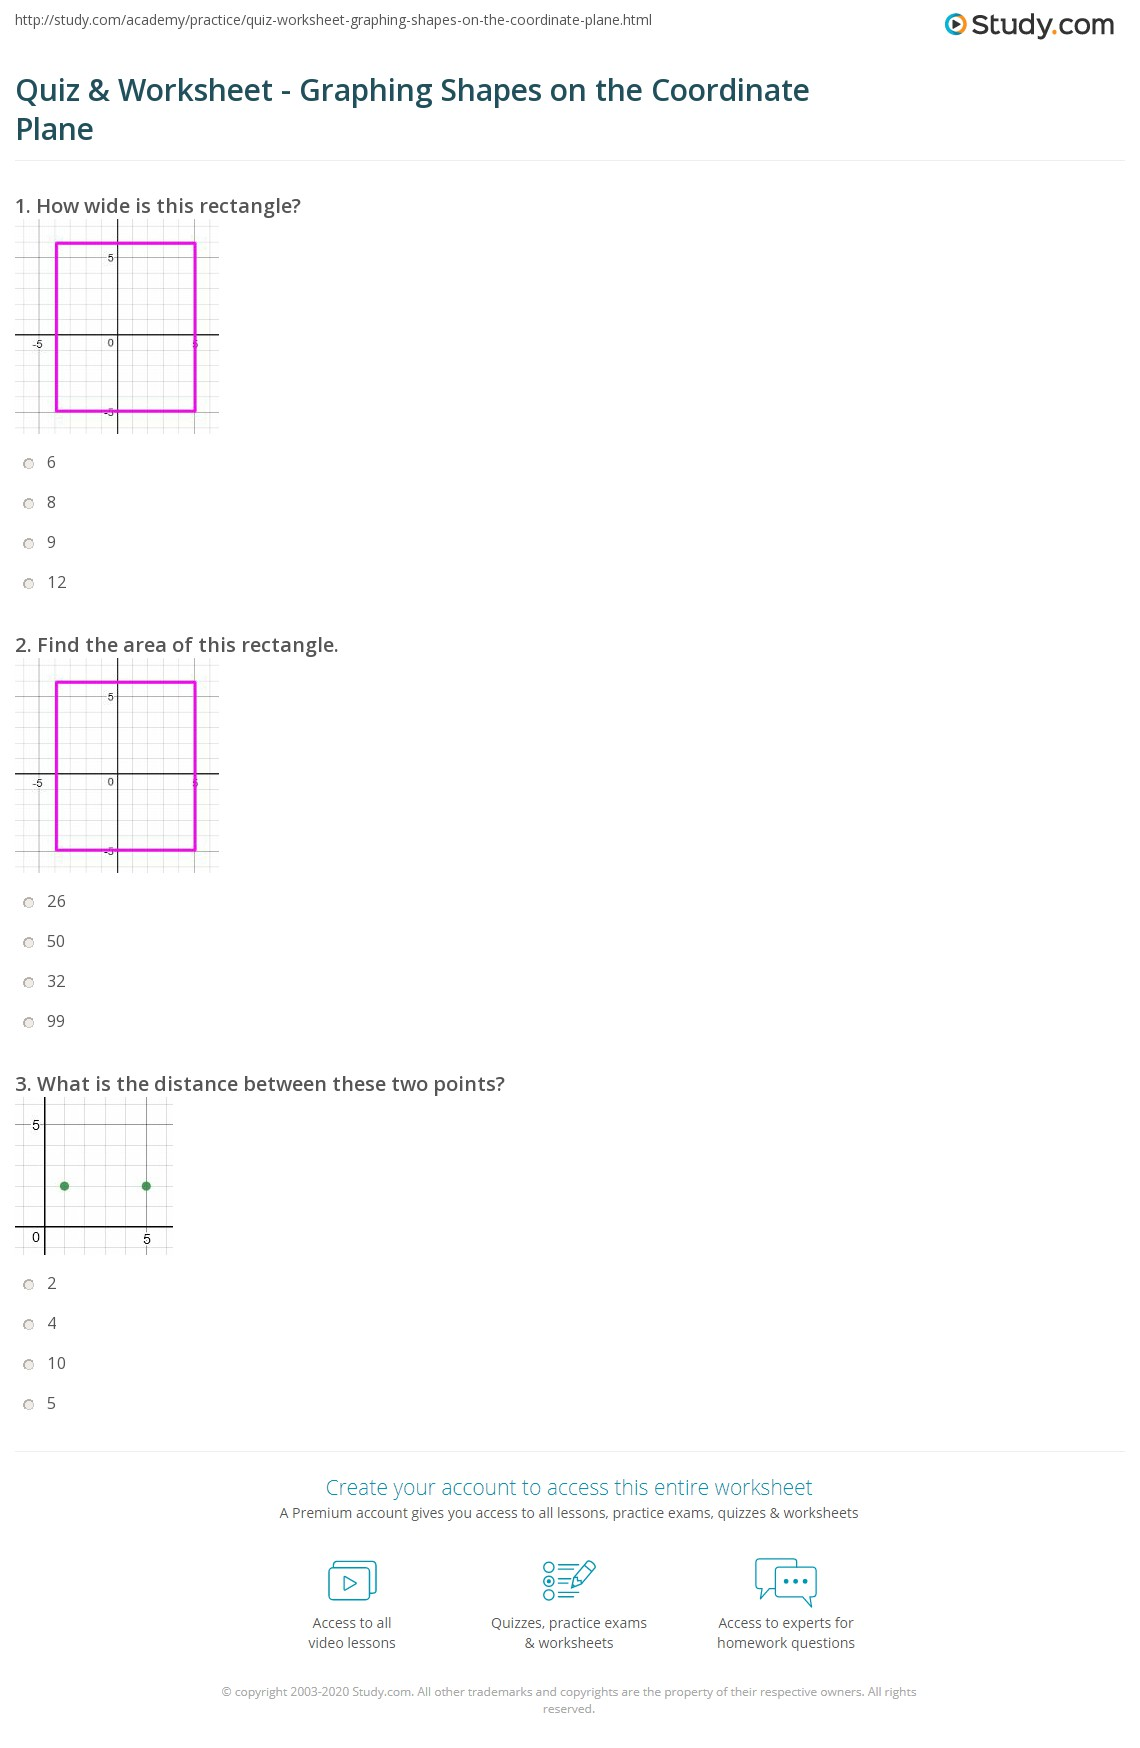 quiz worksheet graphing shapes on the coordinate plane. Black Bedroom Furniture Sets. Home Design Ideas